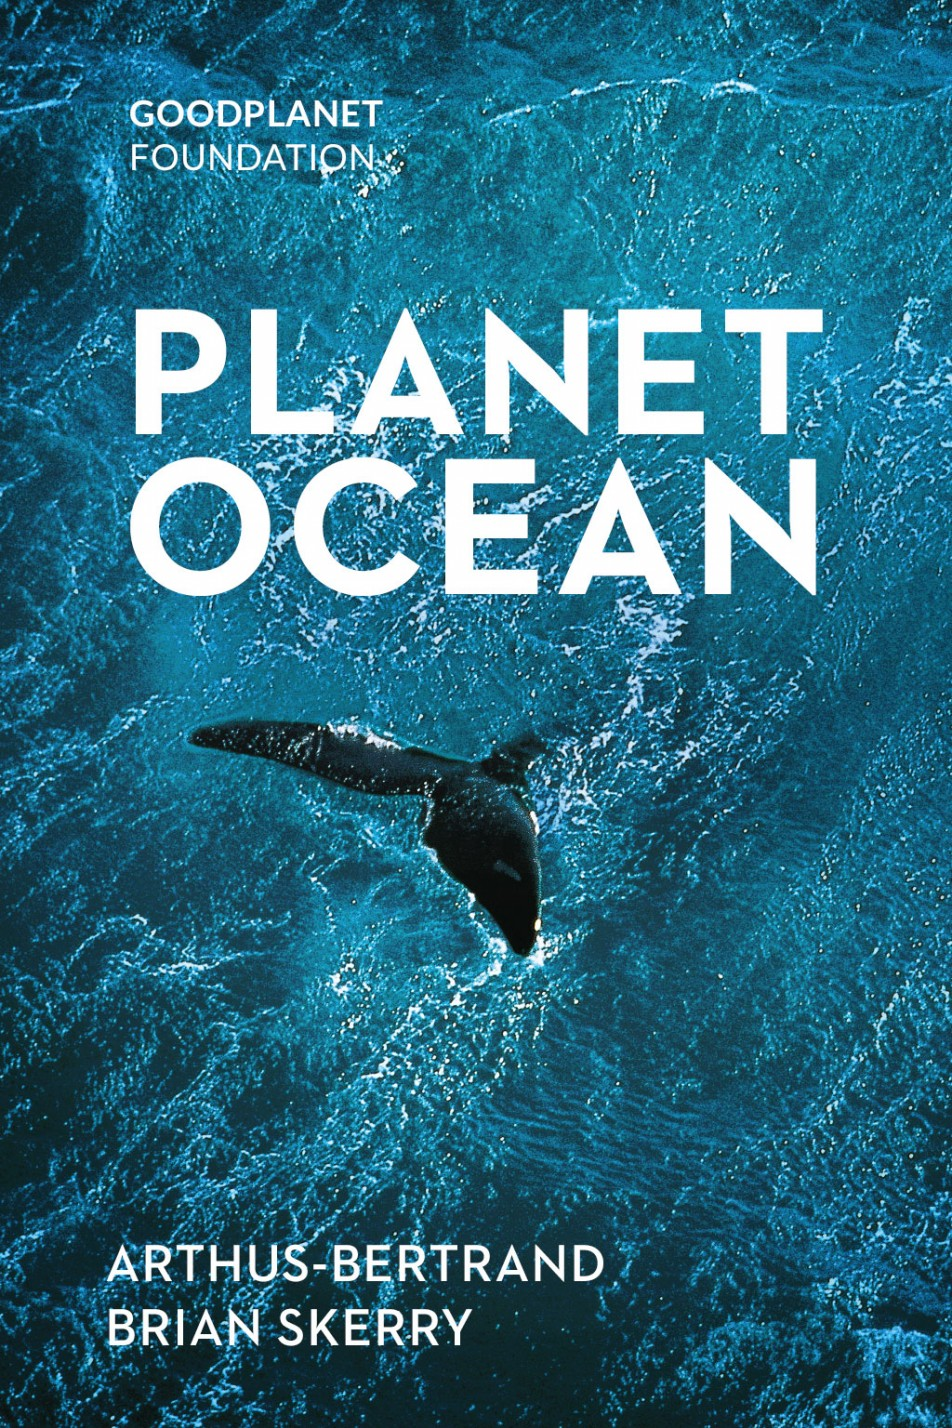 Planete Oceans Yann Arthus Bertrand